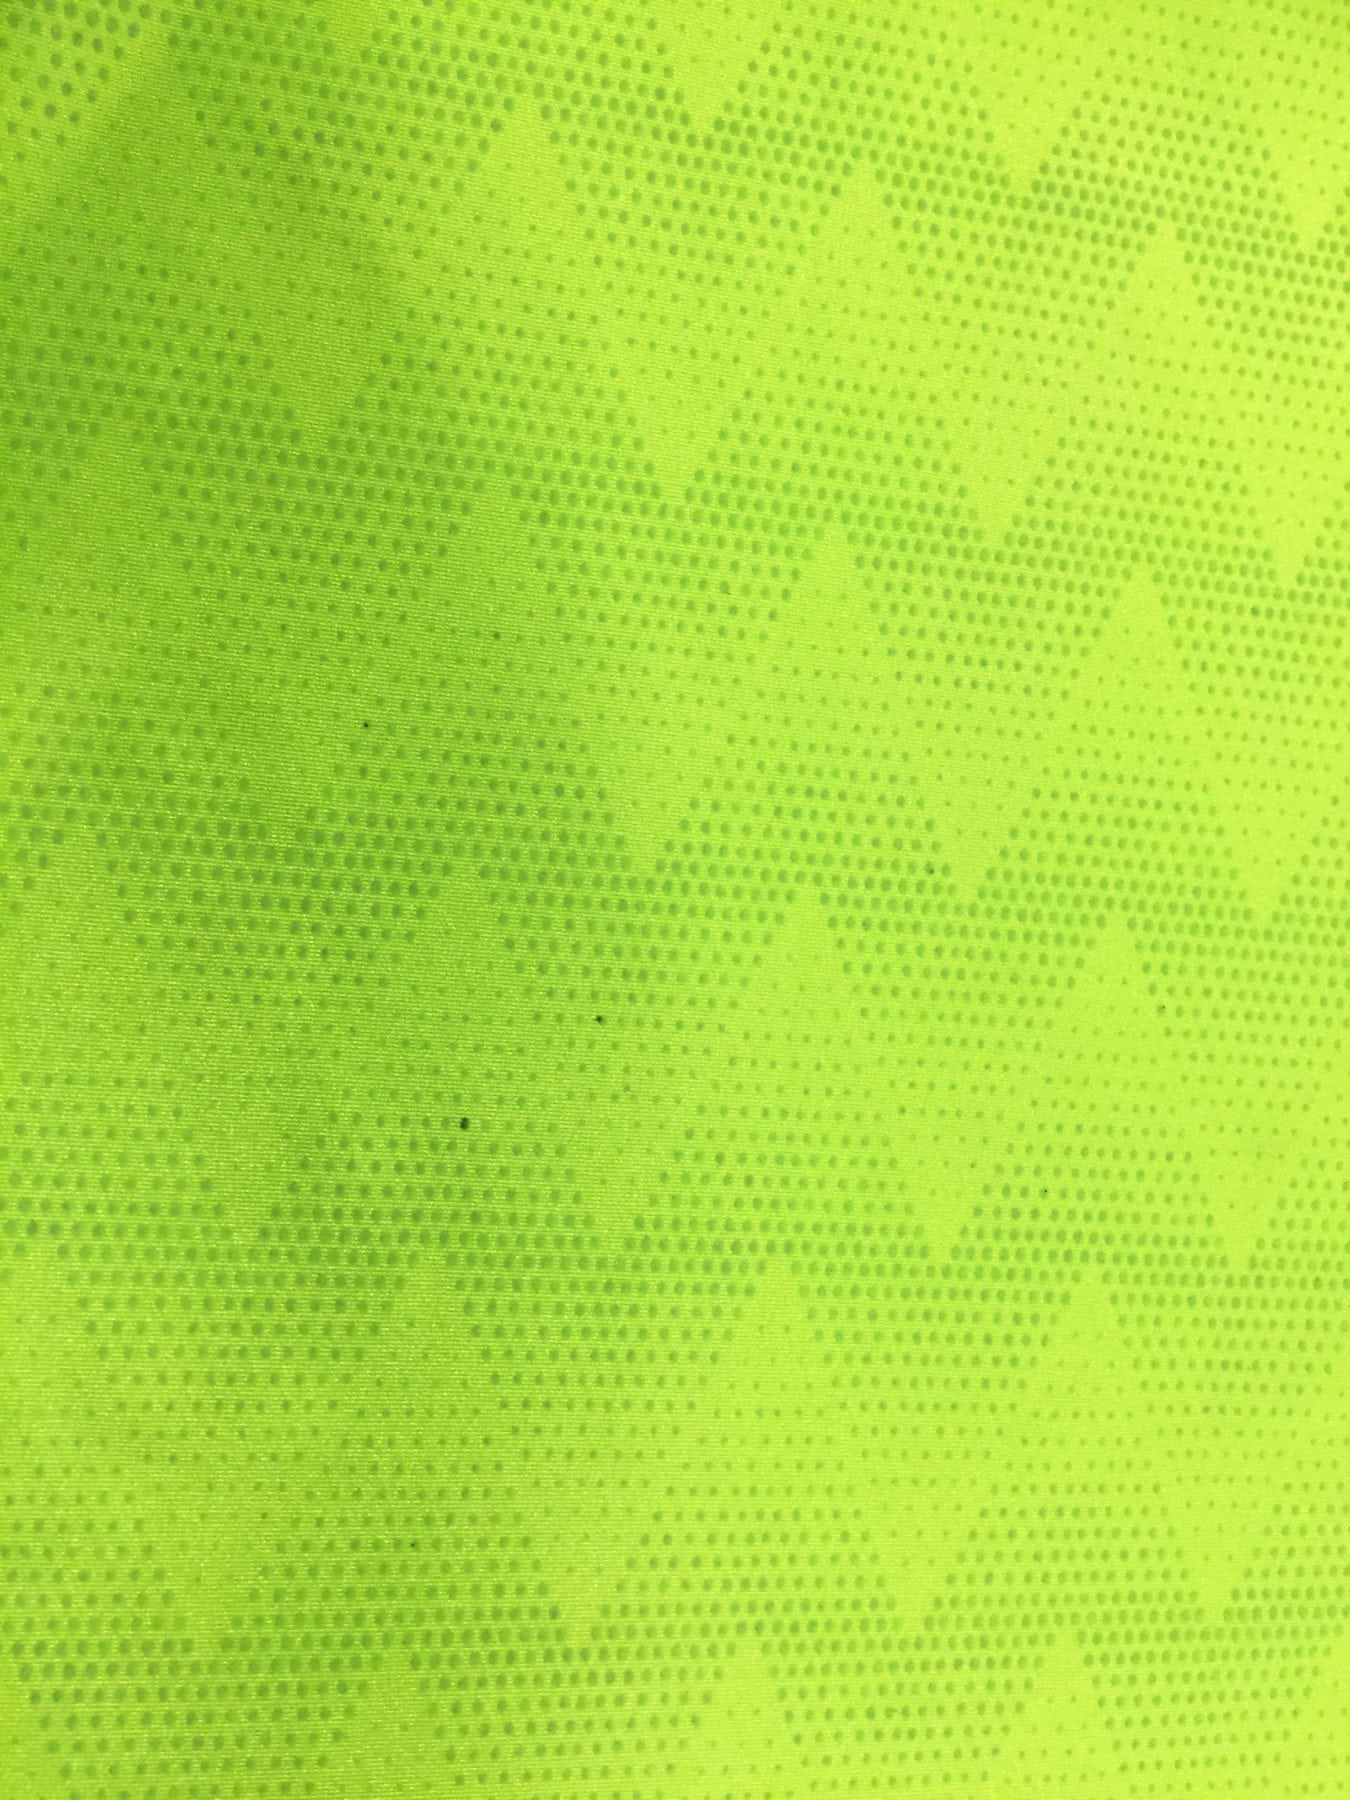 Reflective Chevron Stretch Fabric | Pine Crest Fabrics